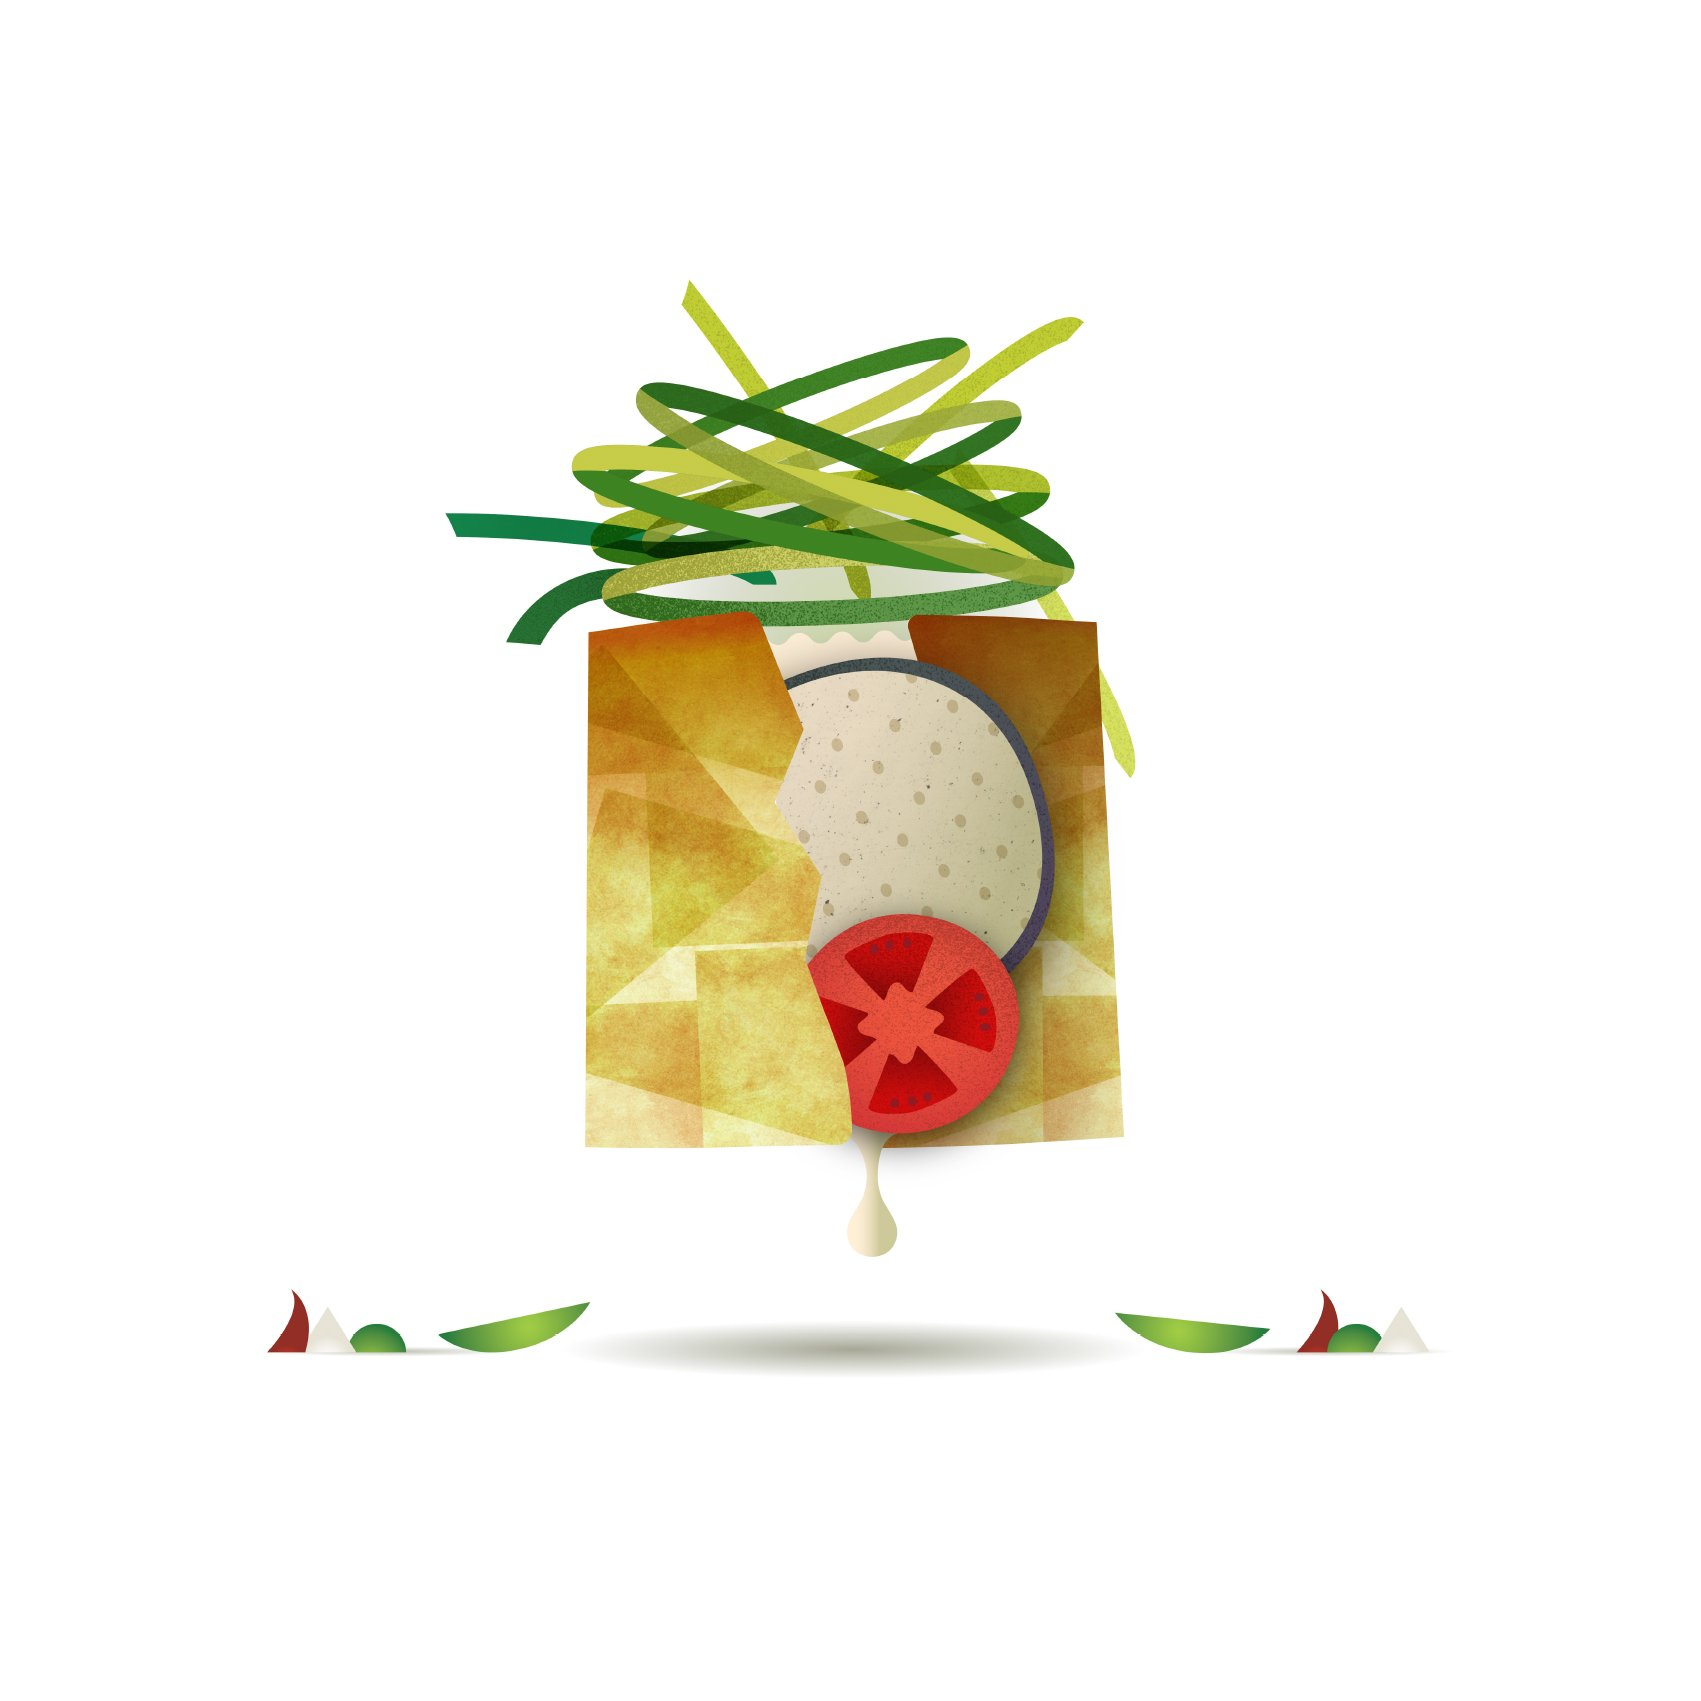 Sublime food design ricette in cibografica 33